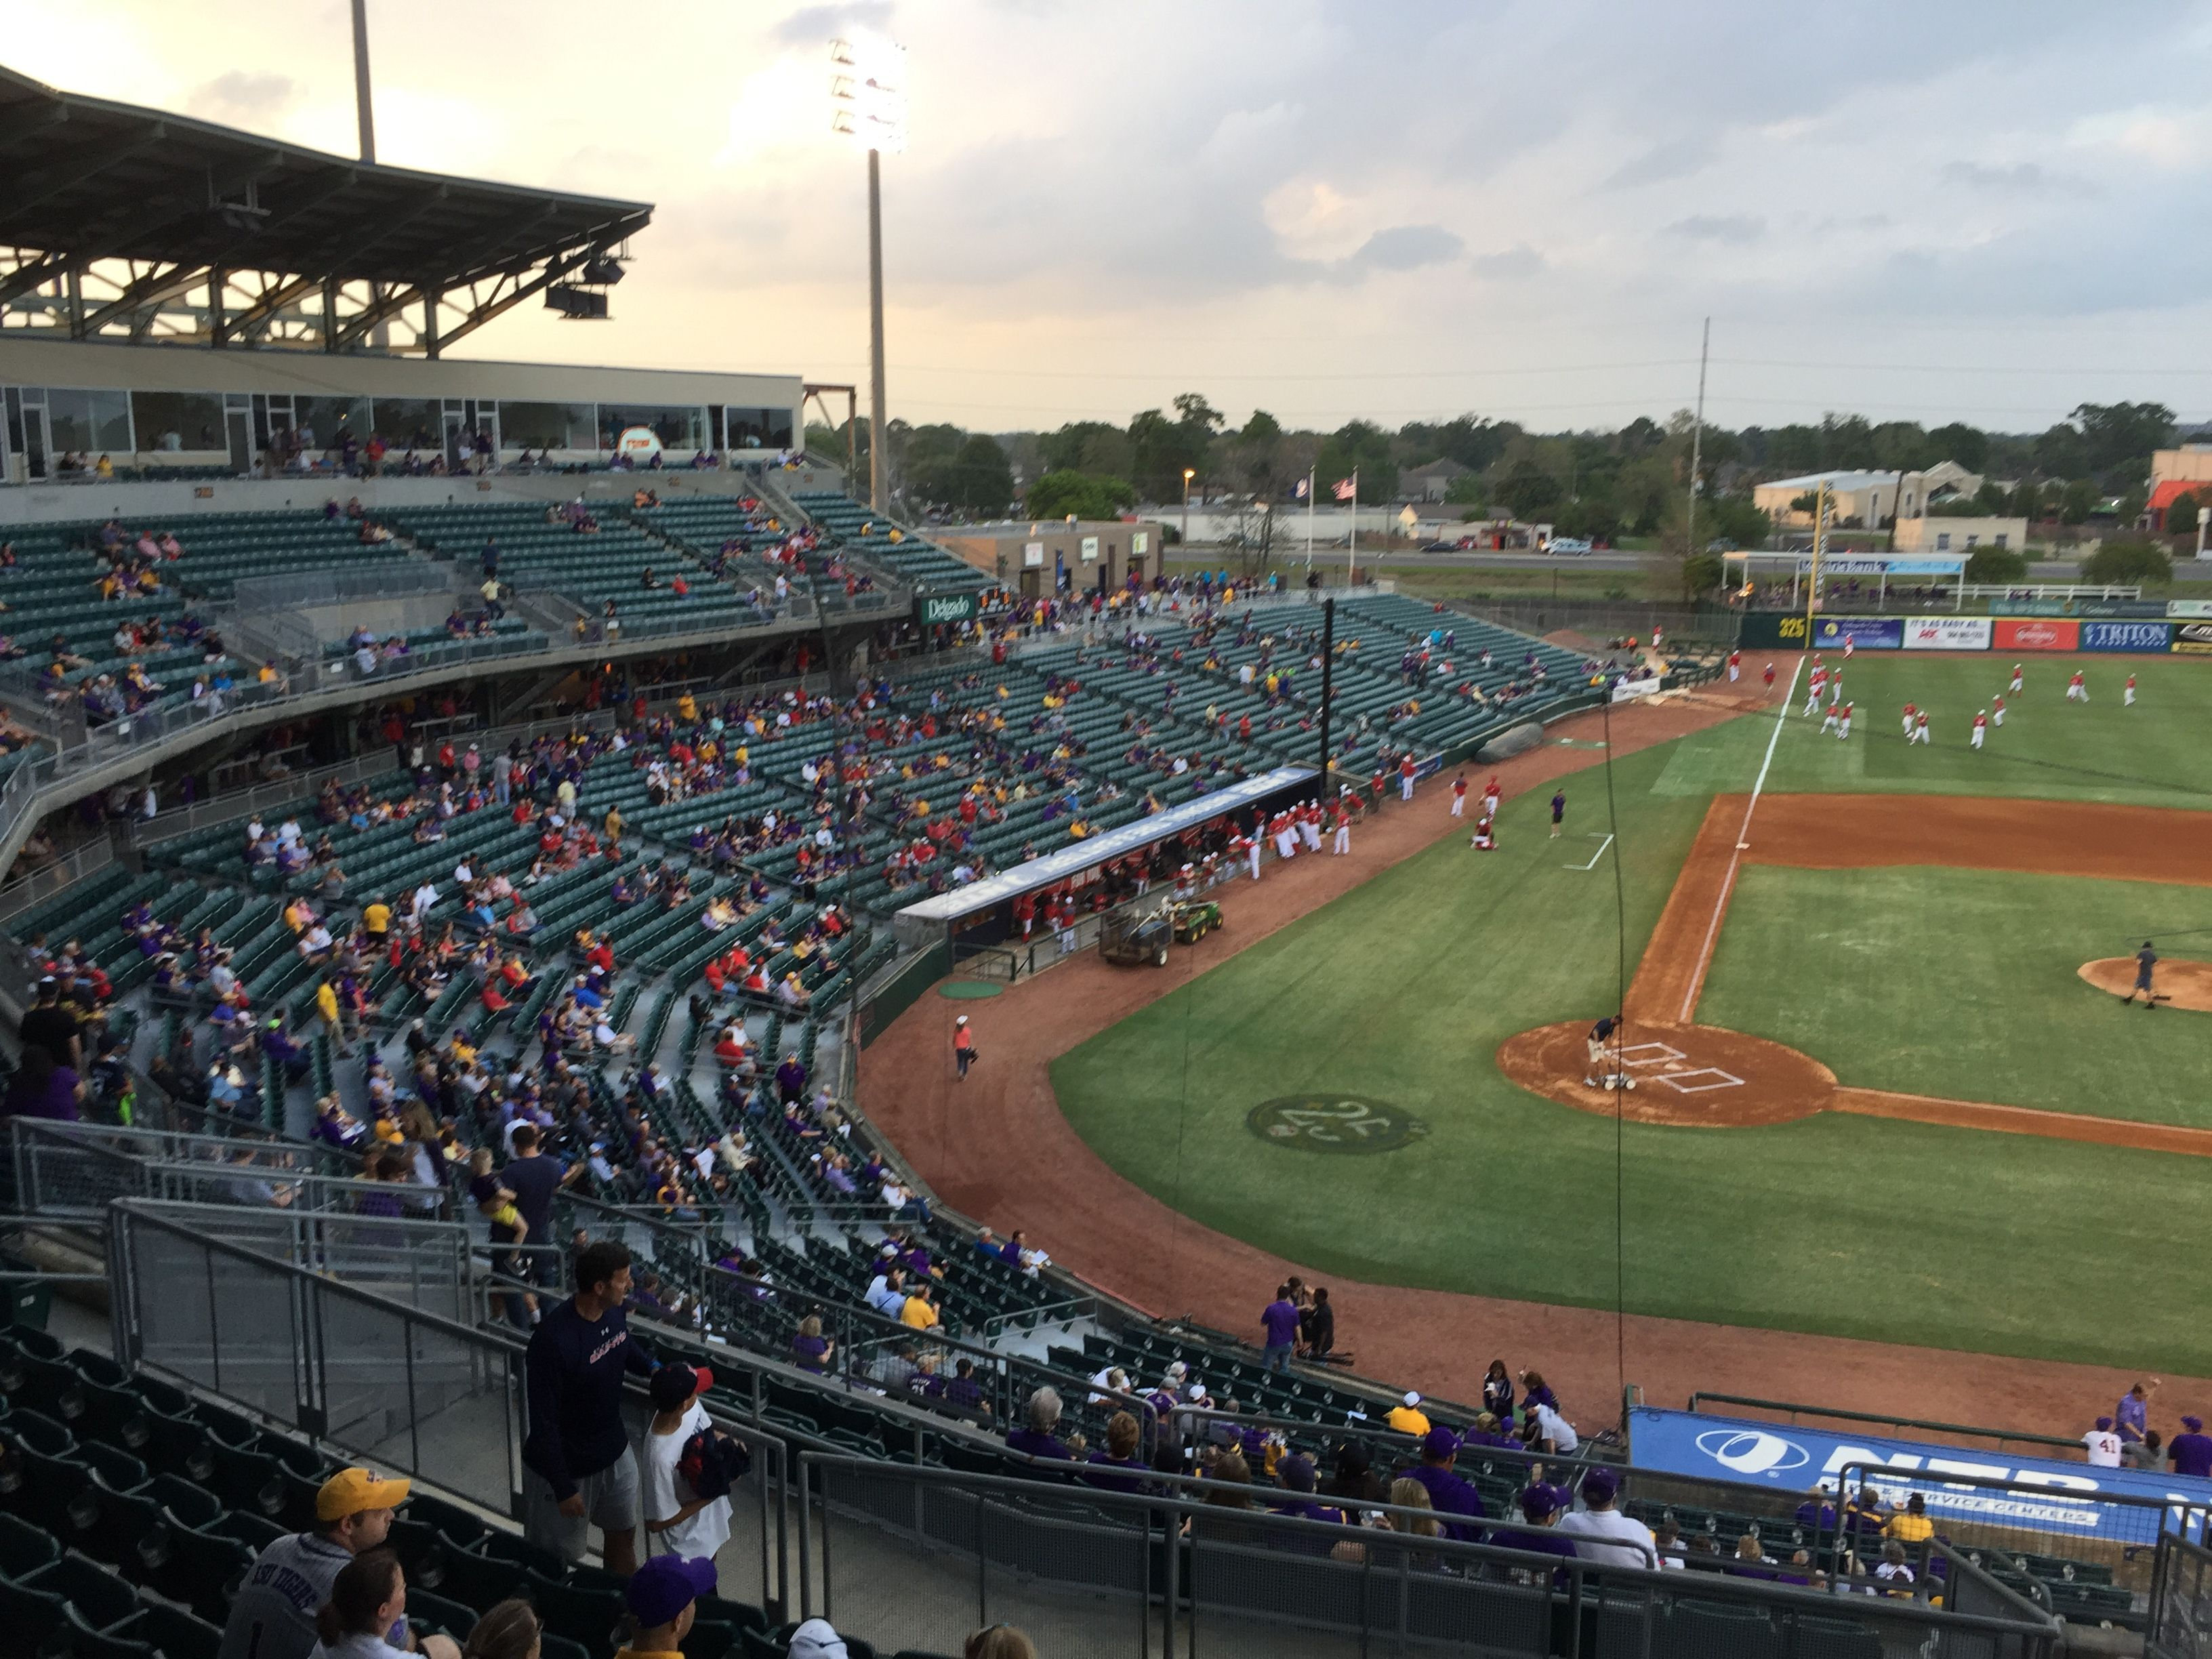 Pin By Michael Sanchez On Wally Pontiff Jr Baseball Classic 2018 With Images Baseball Classic Baseball Field Baseball